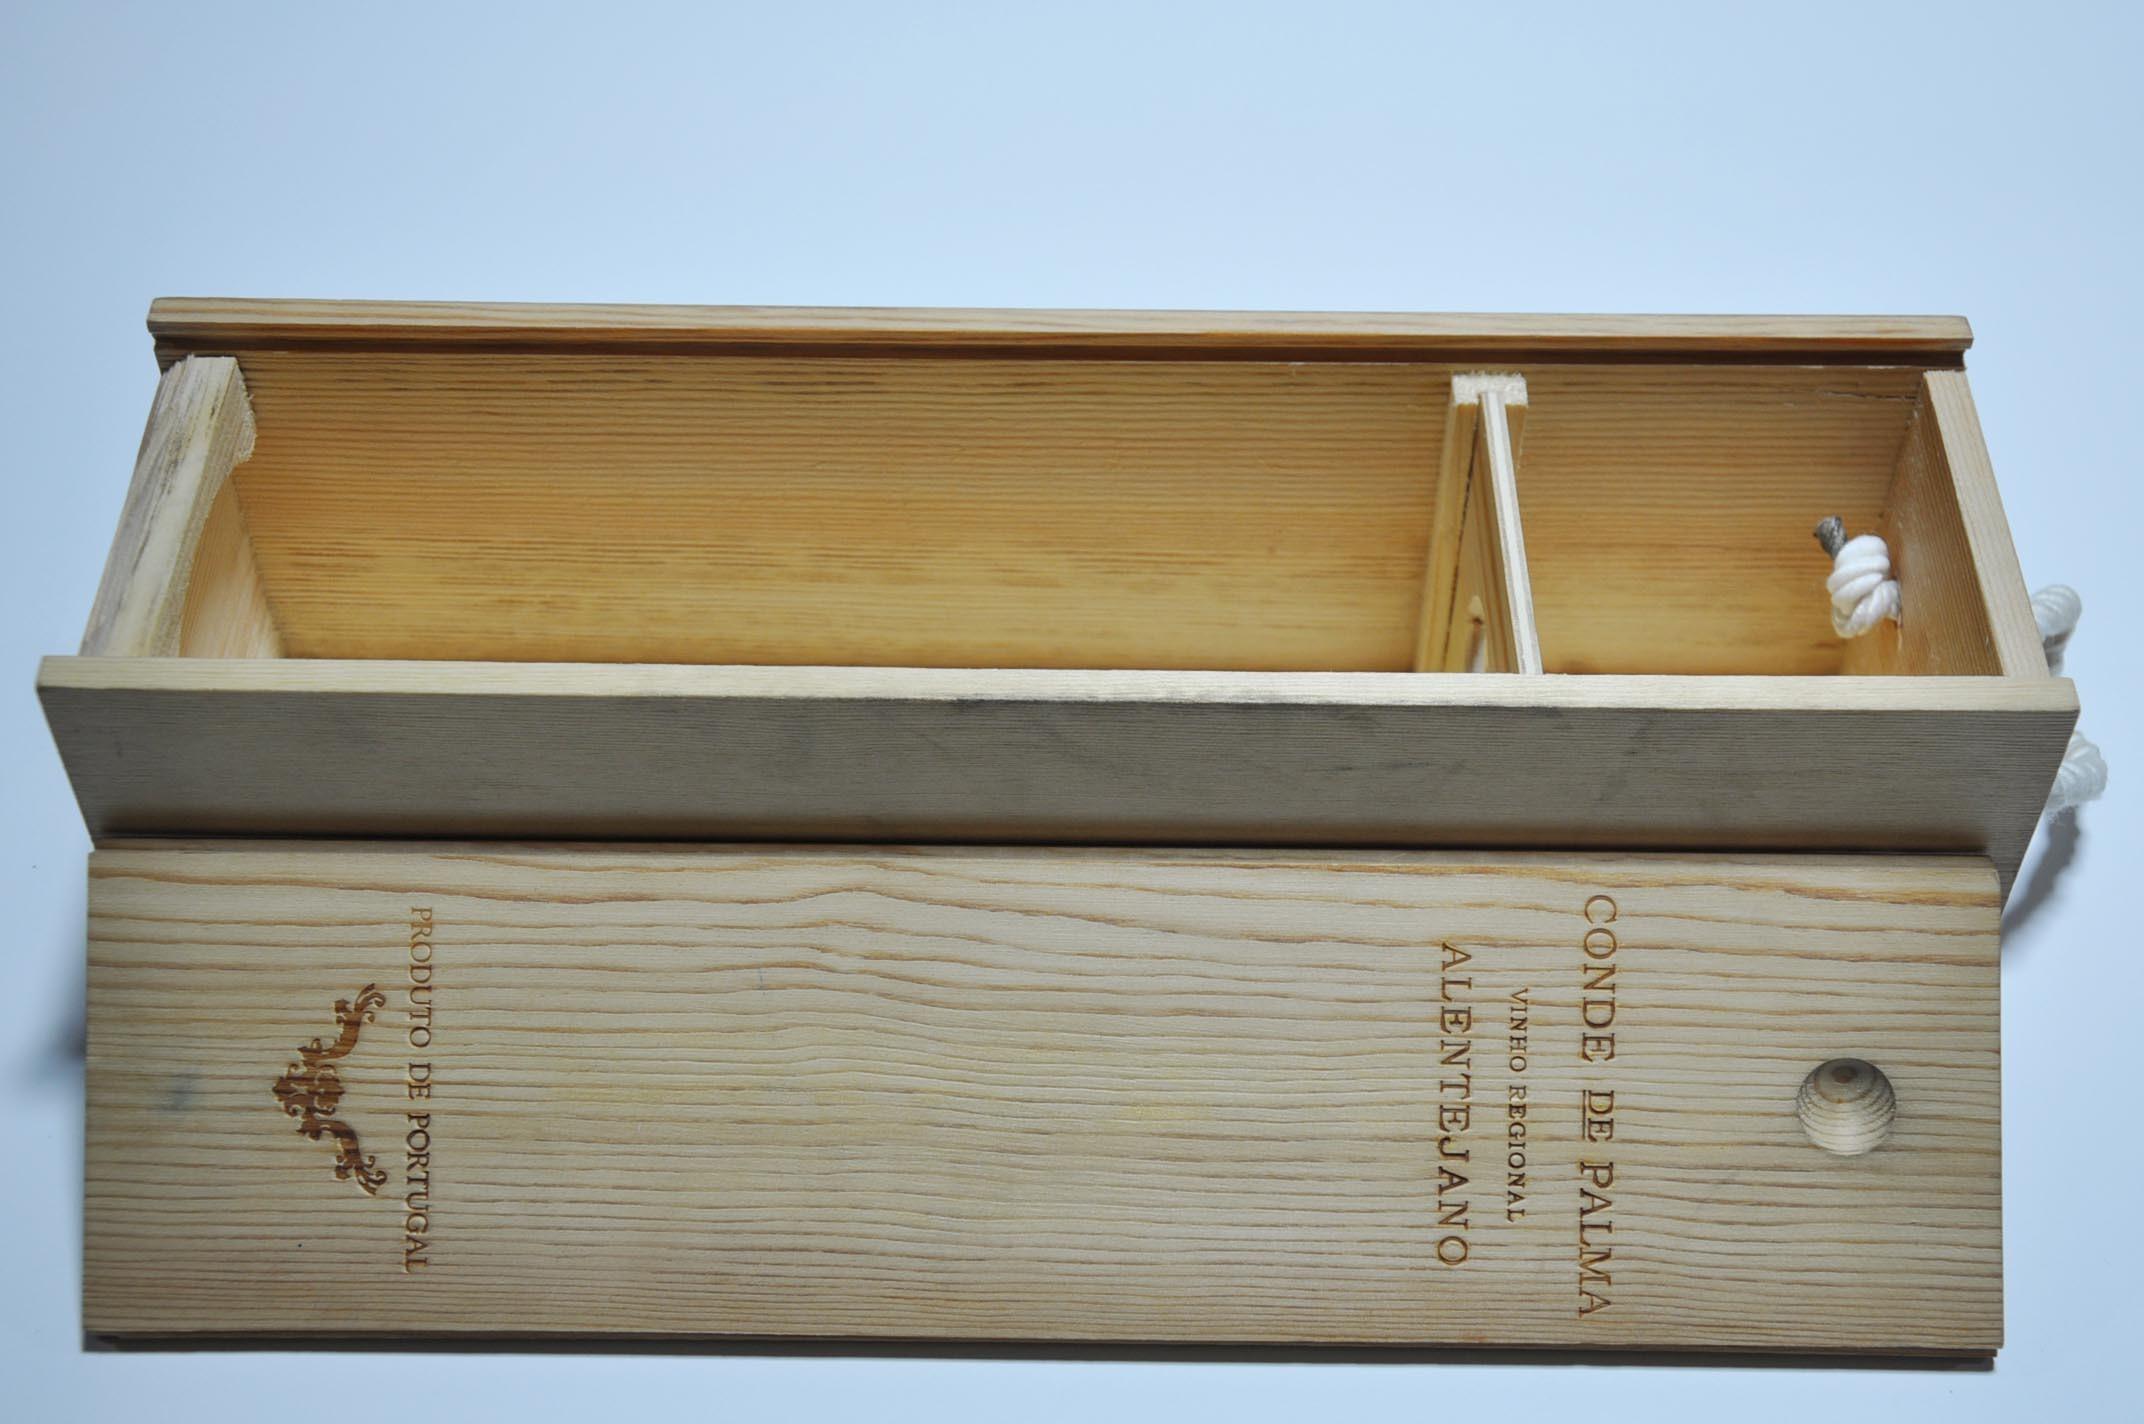 Caja de madera de empaquetado de madera de la caja de la - Empaquetado de regalos ...